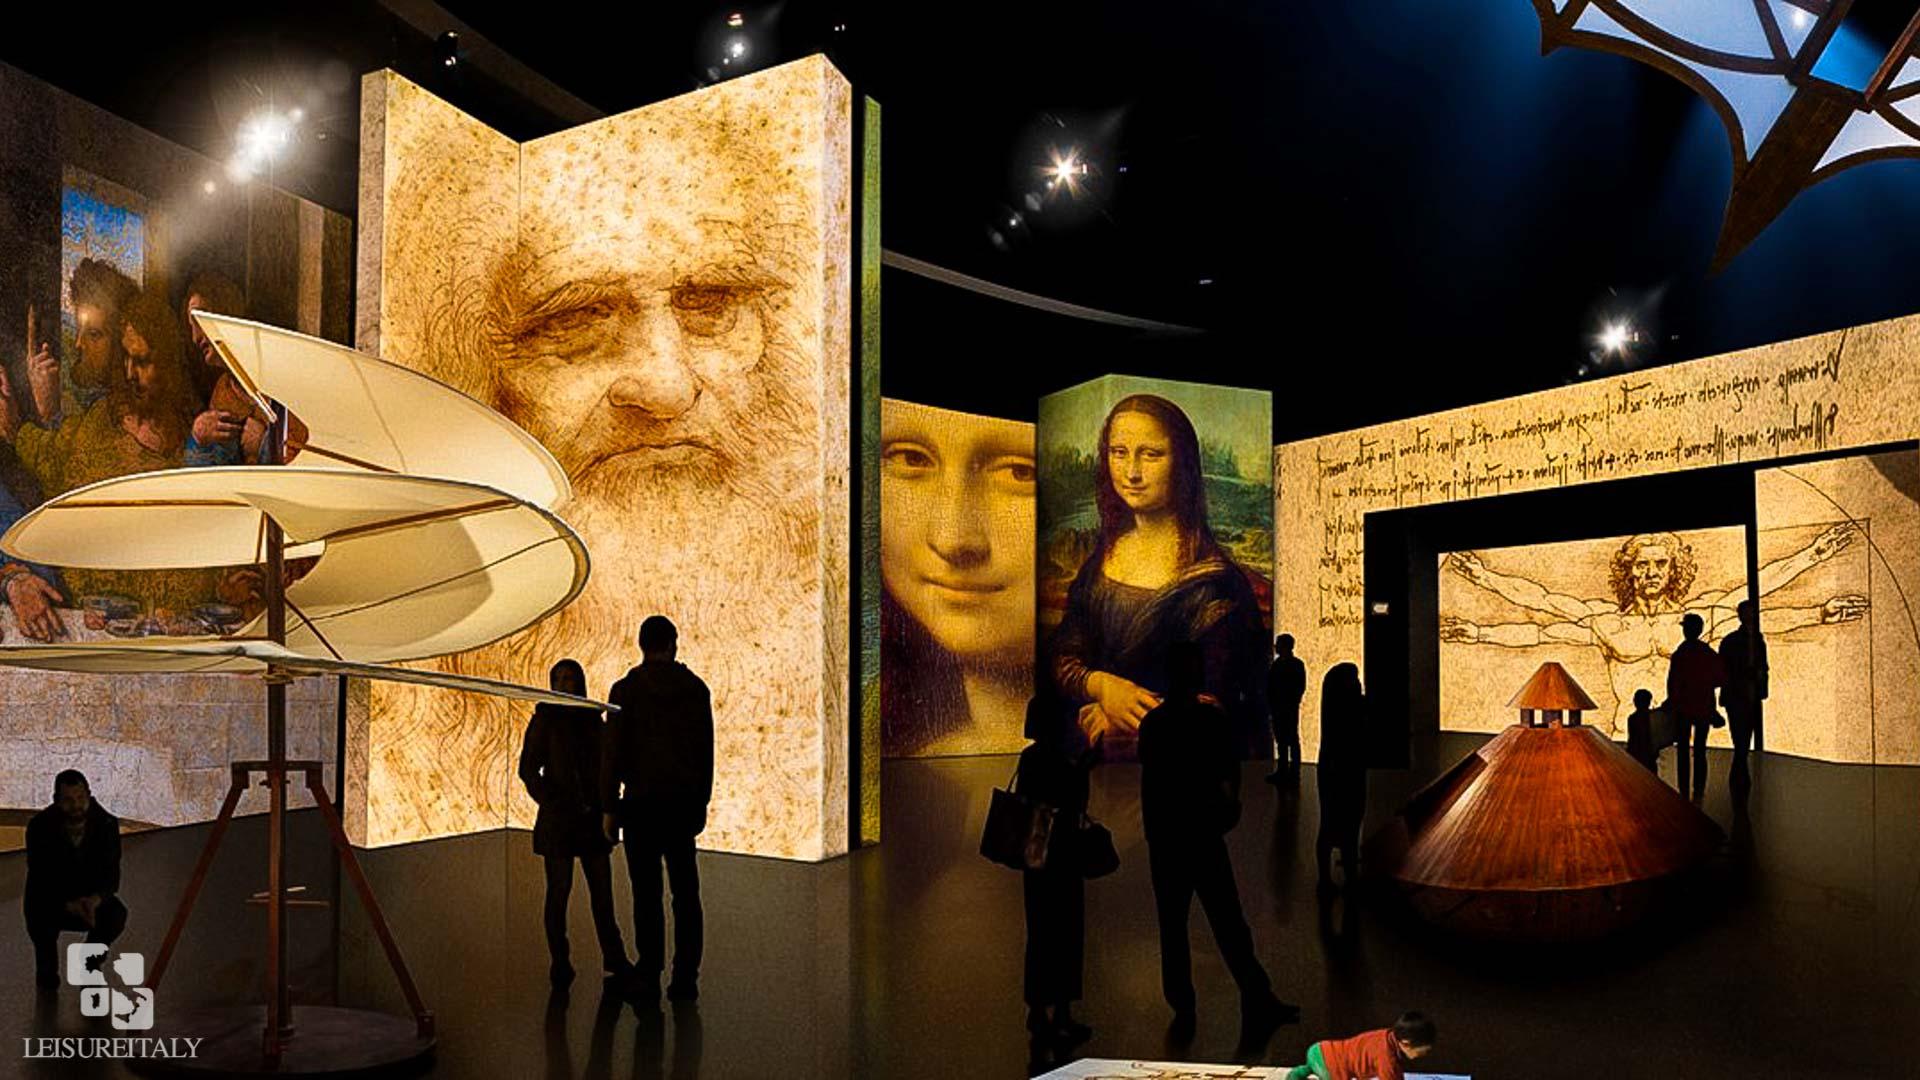 Leonardo Da Vinci Museum In The Heart Of Florence - Leisure Italy